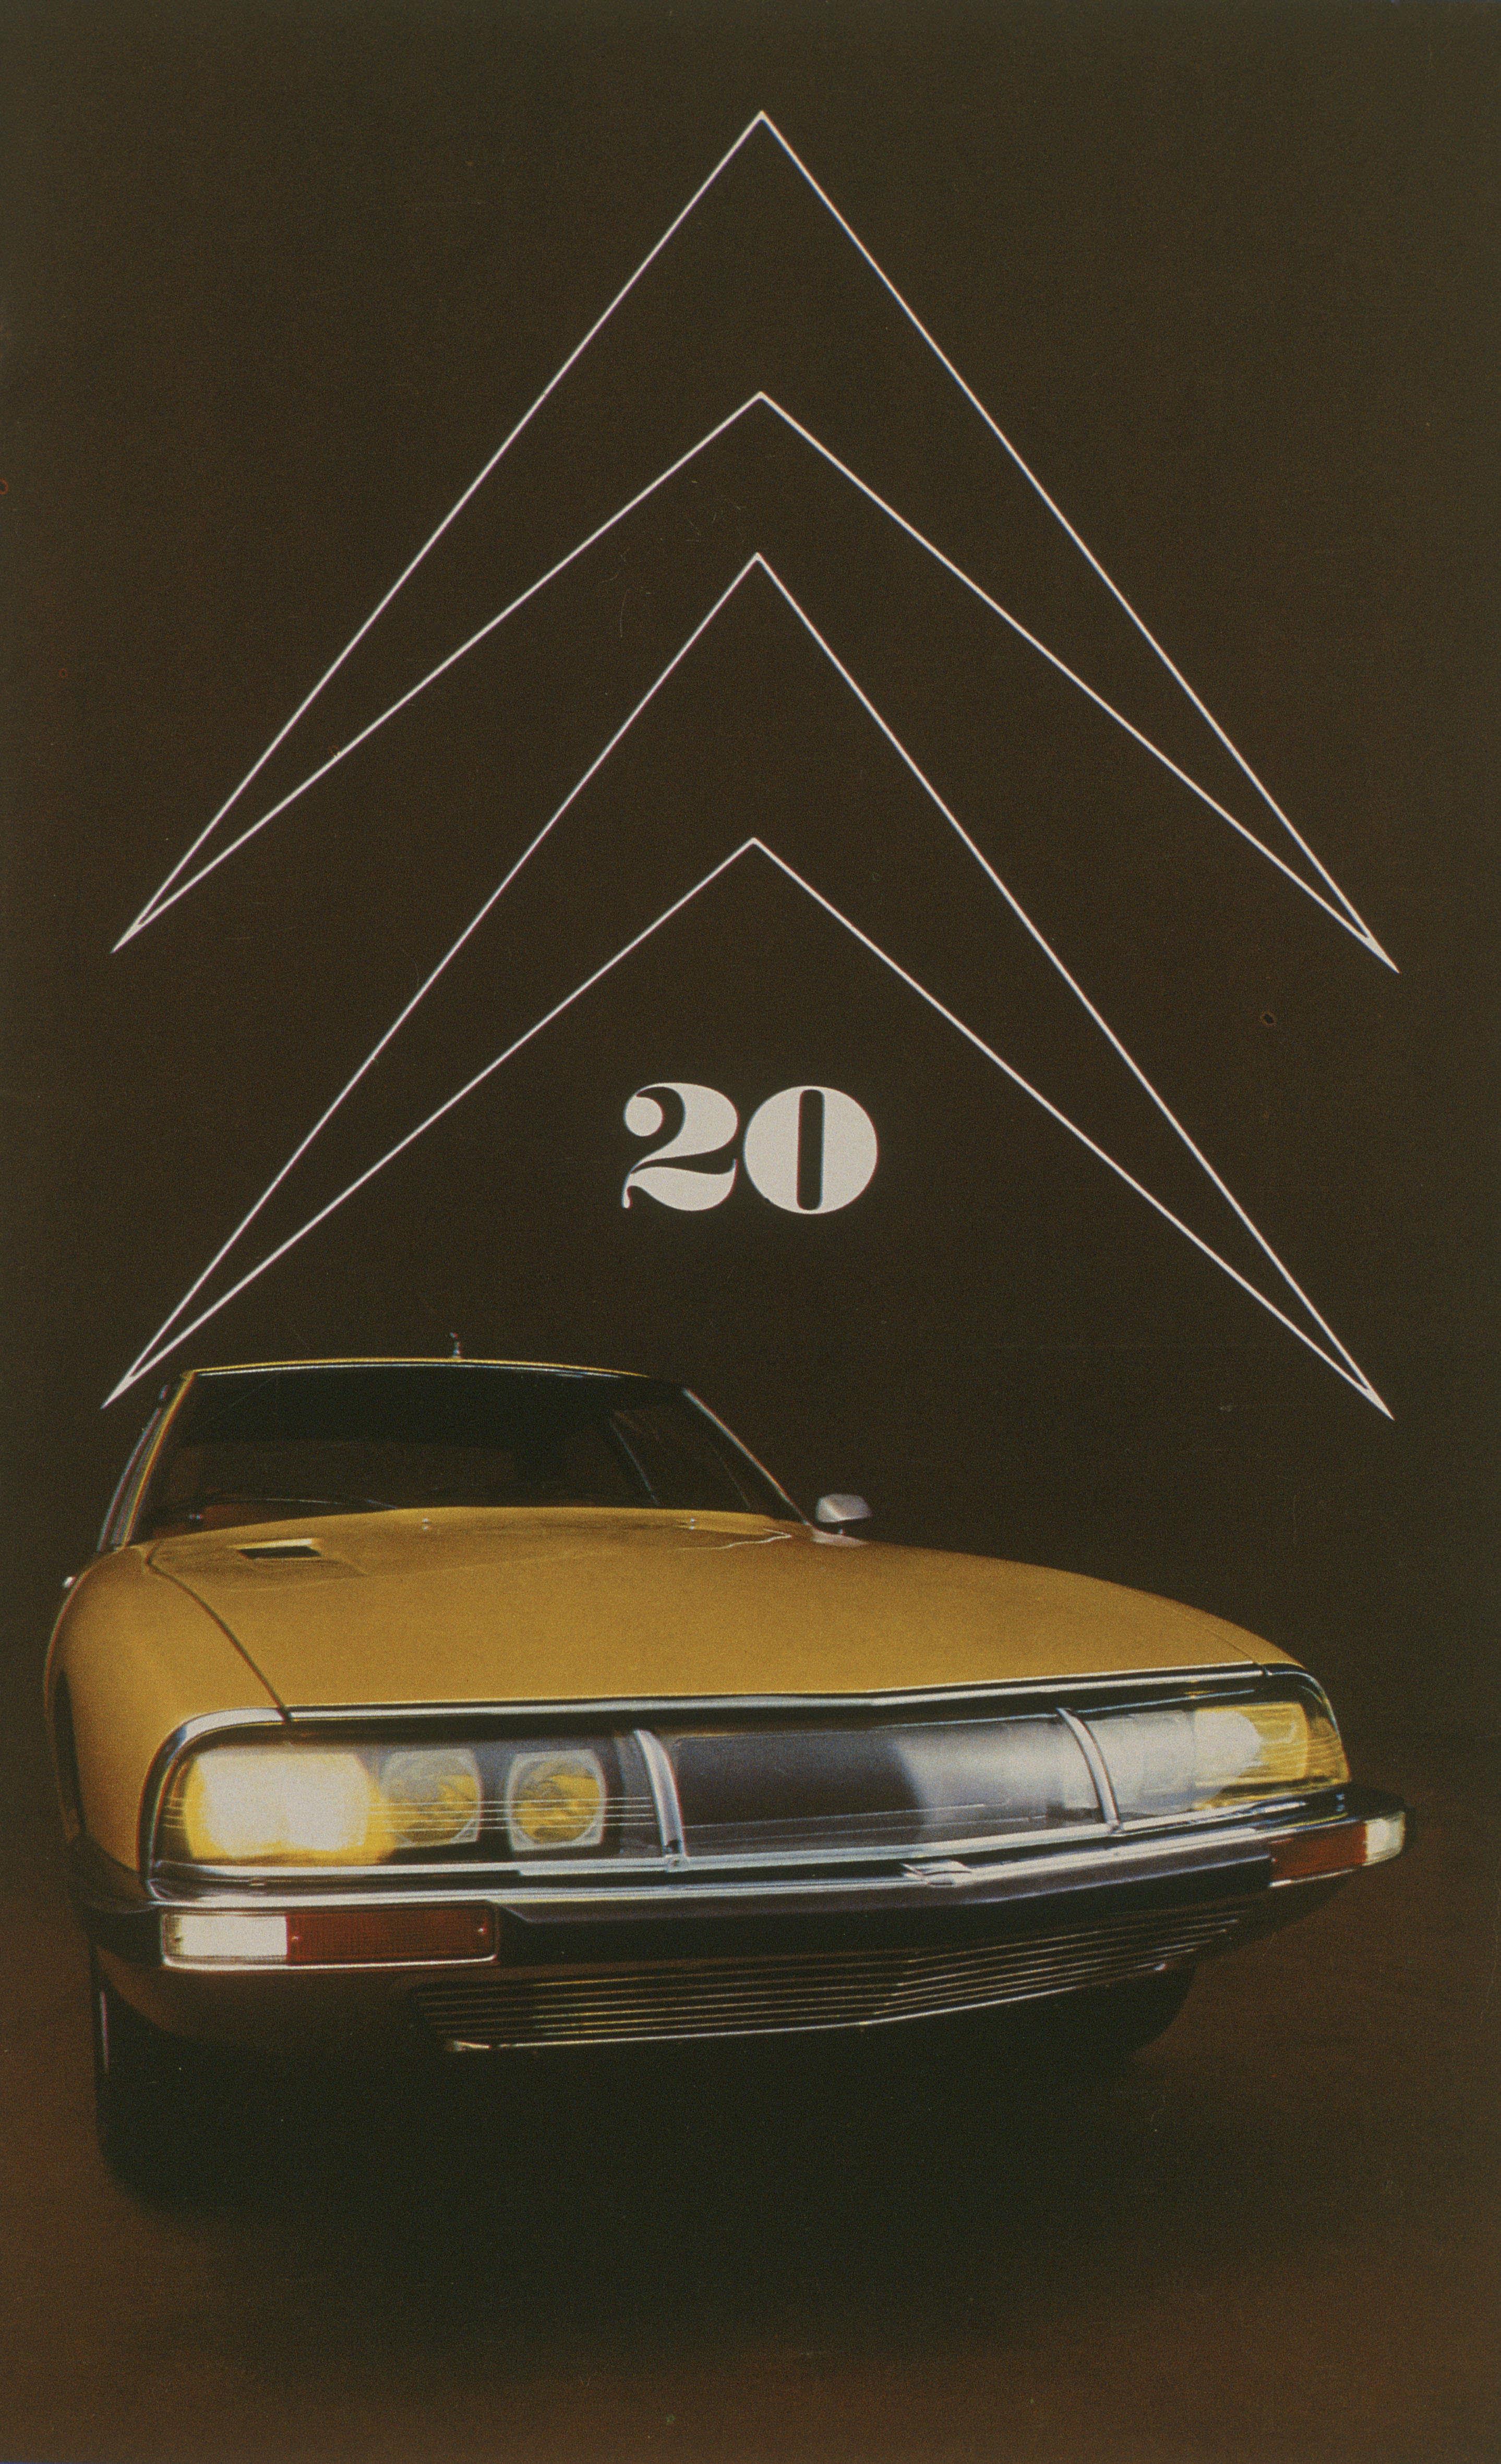 Double Chevron n°20 - SM - 1970